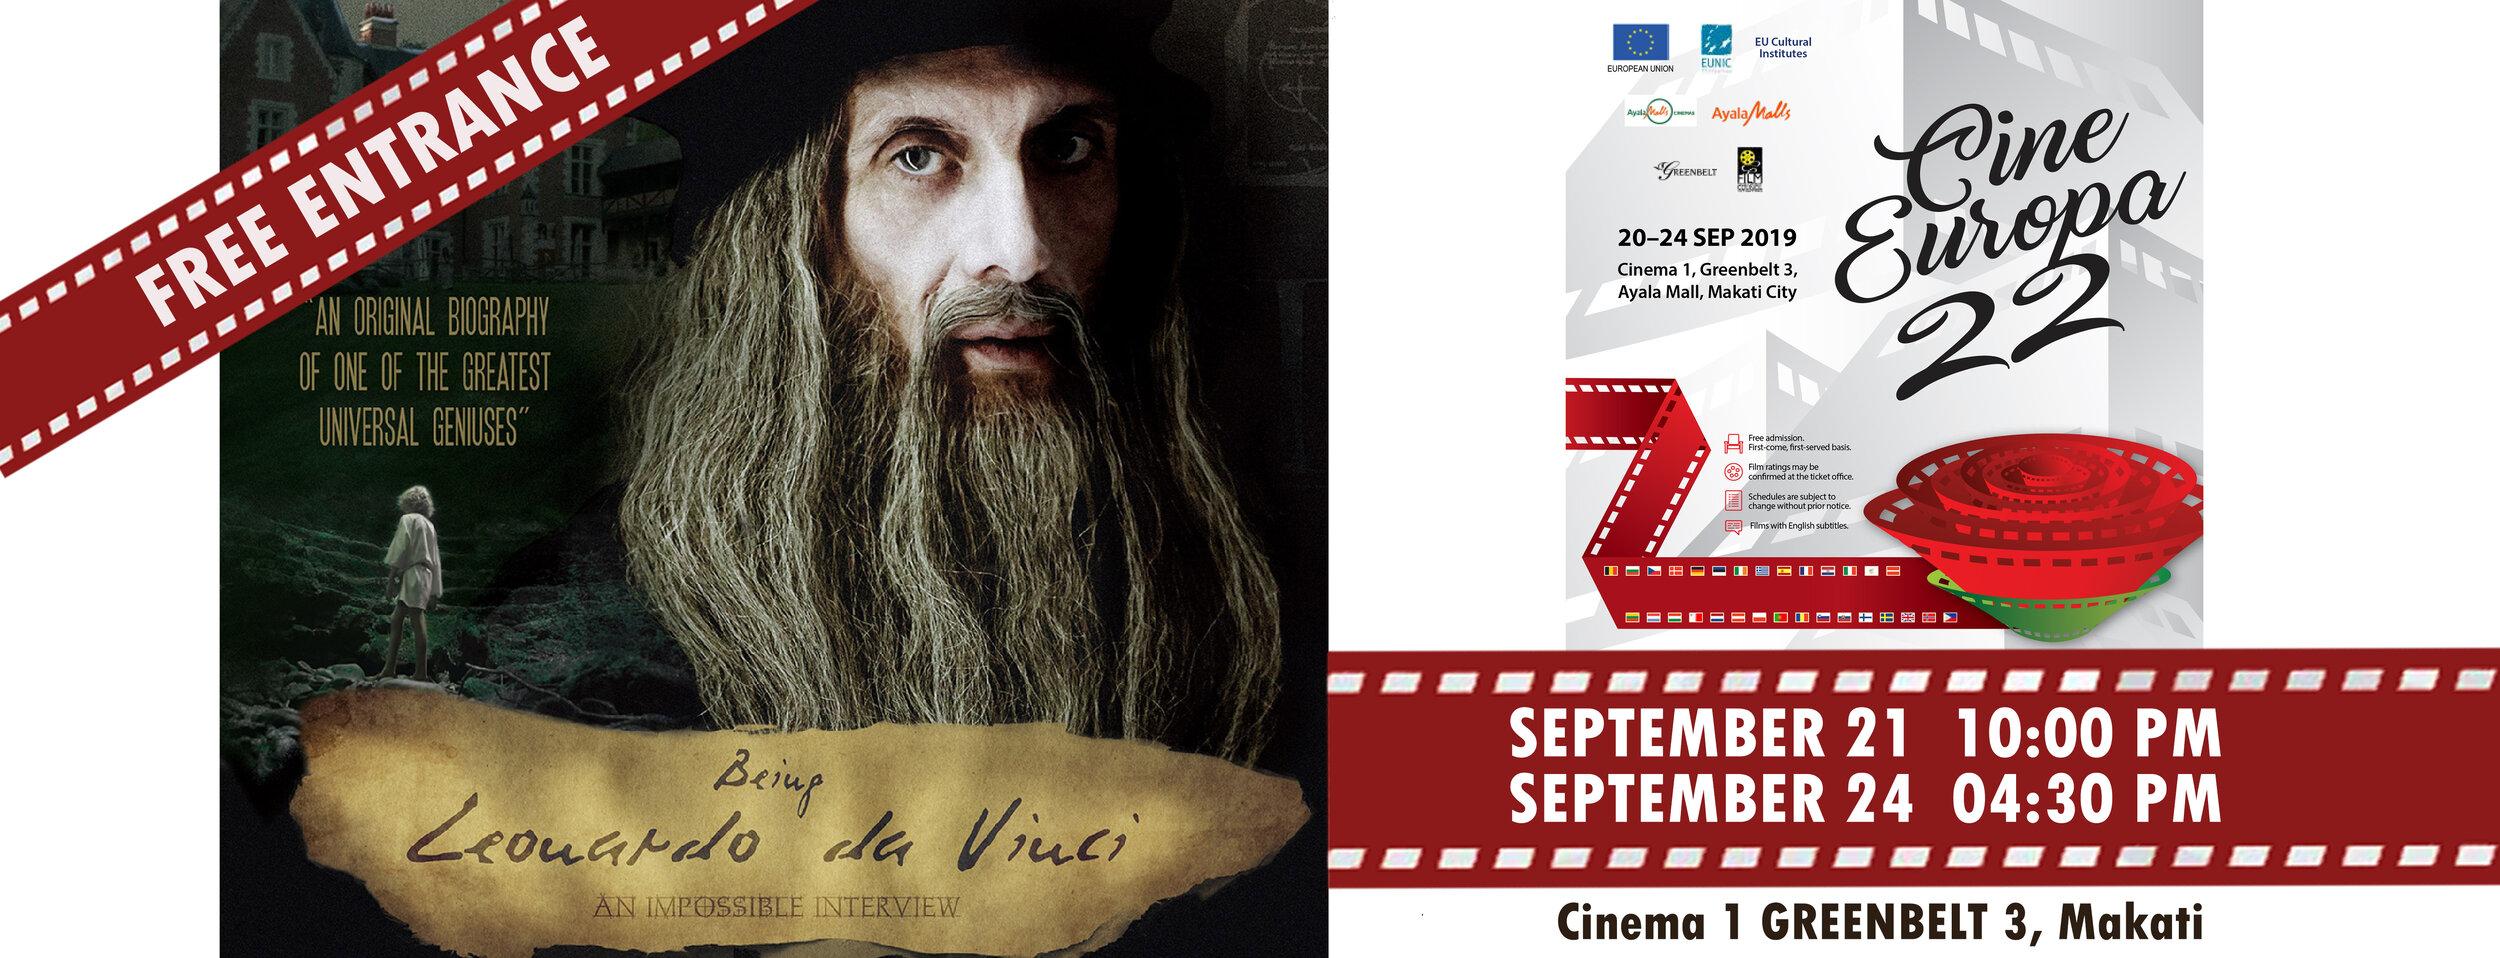 fb page banner Cine Europa screening.jpg